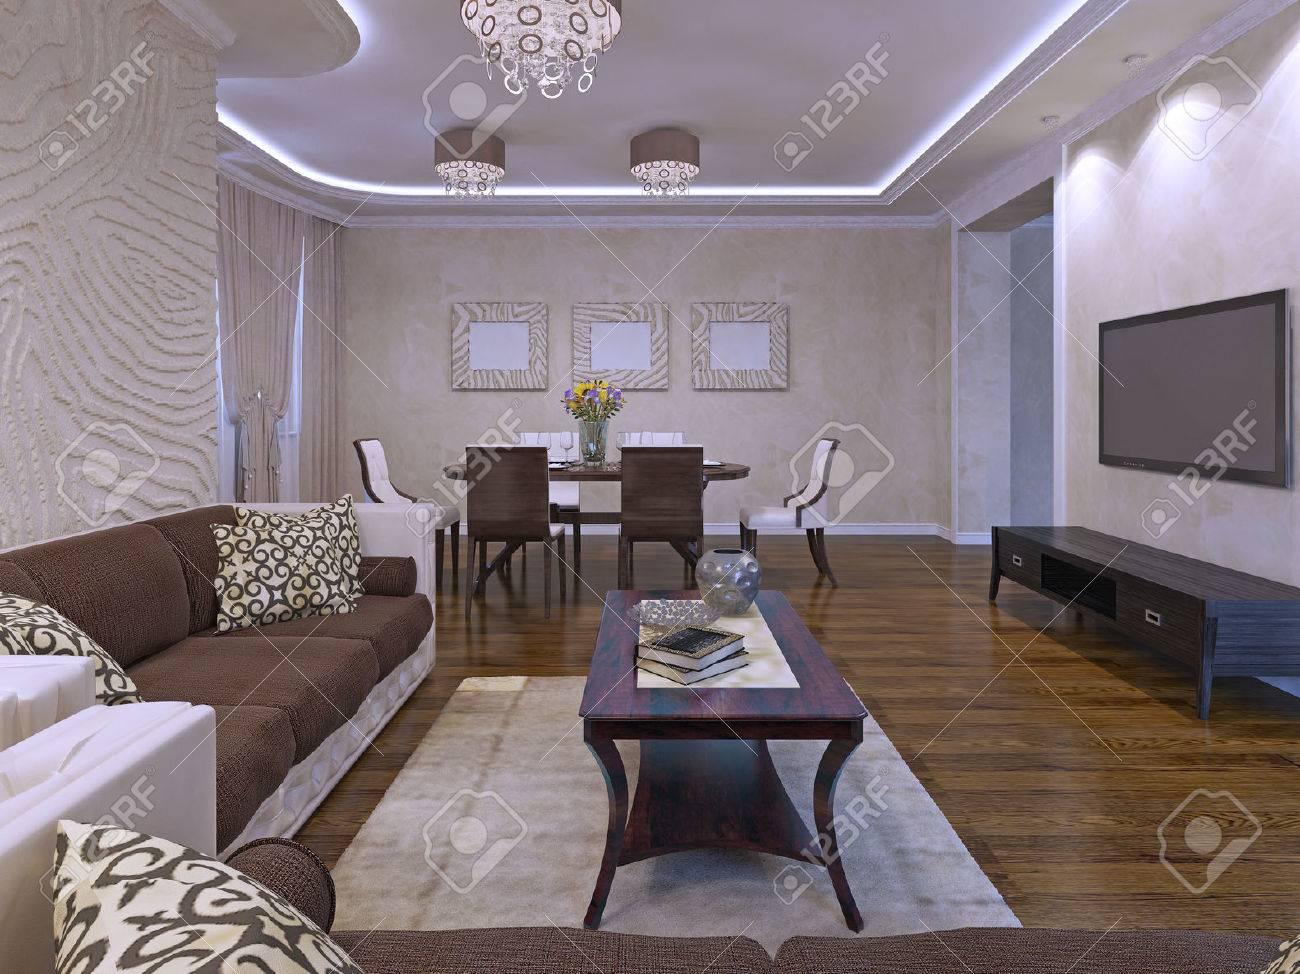 Elegante lounge kamer design in crème en bruine kleuren